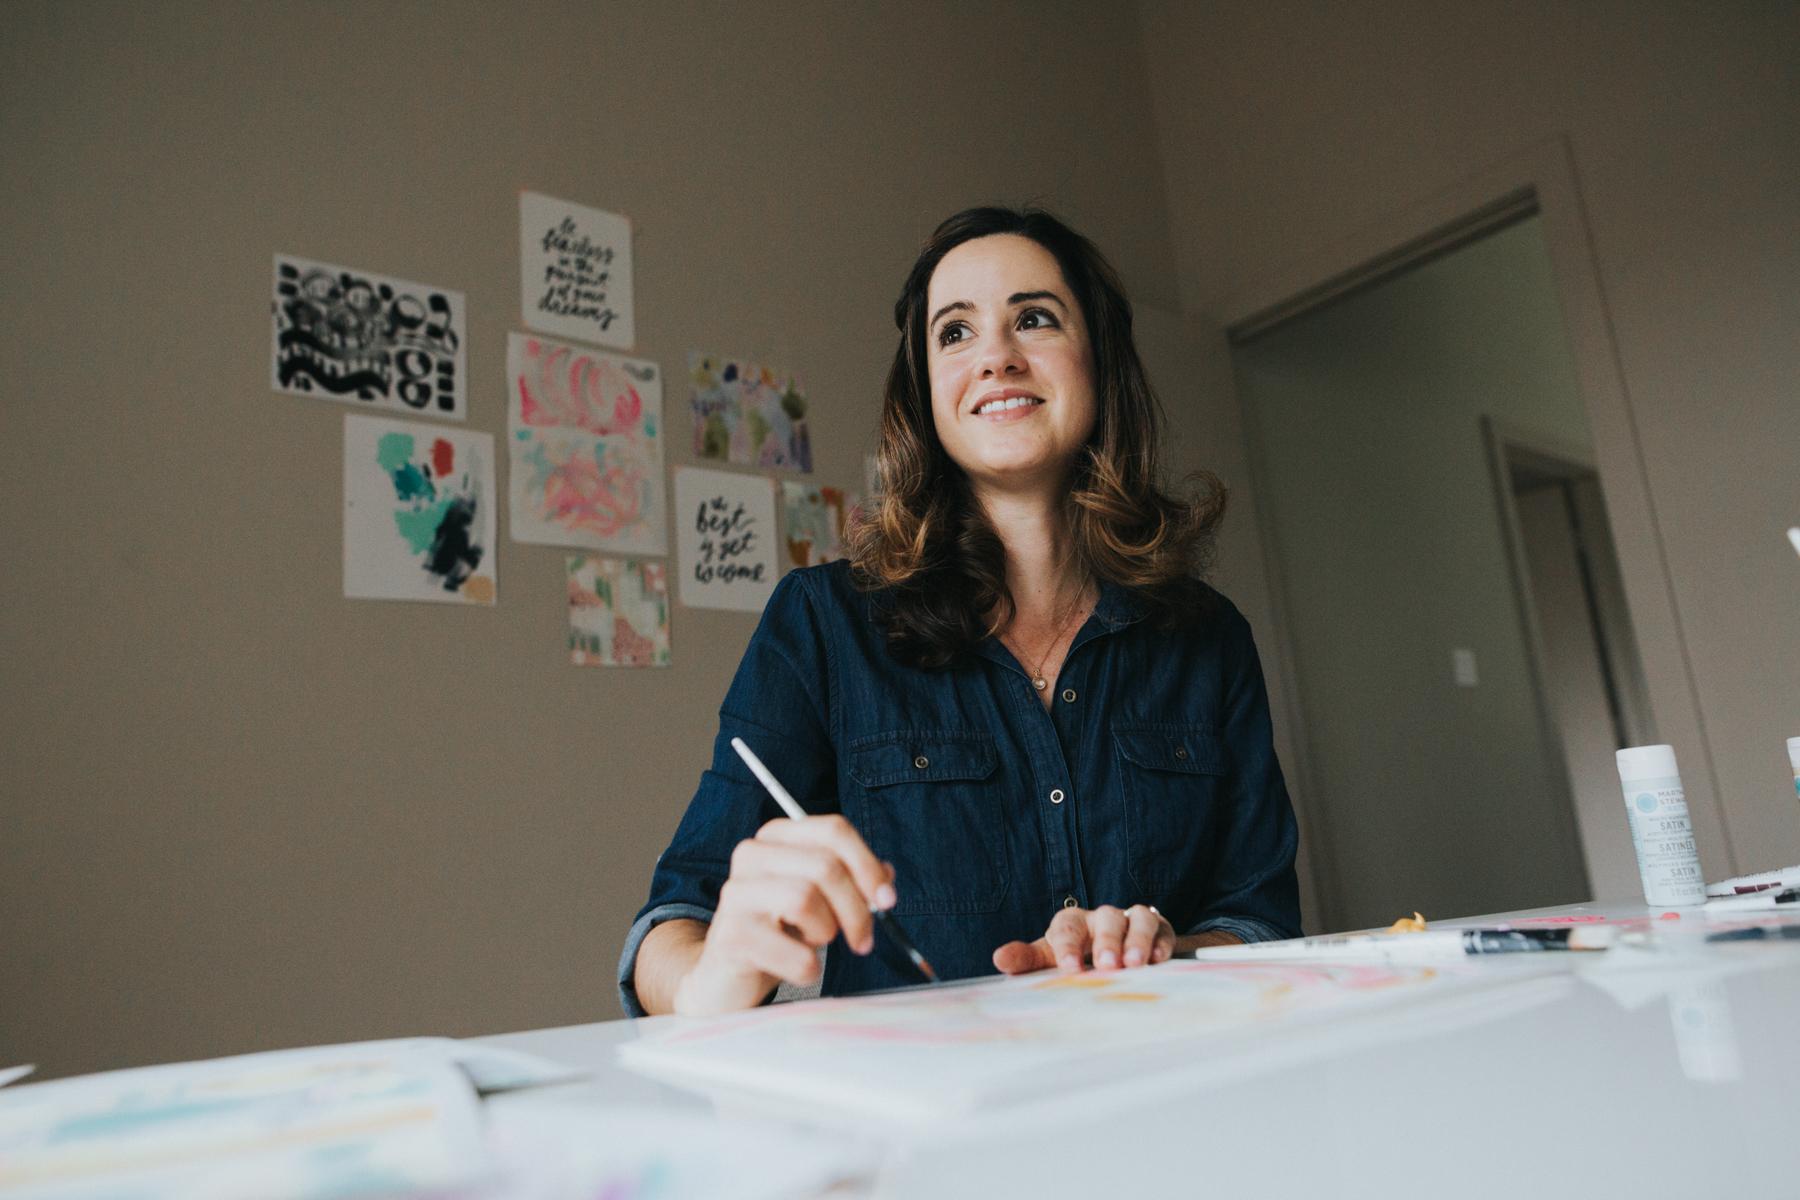 Fine Day Press - Diana Ascarrunz Photography